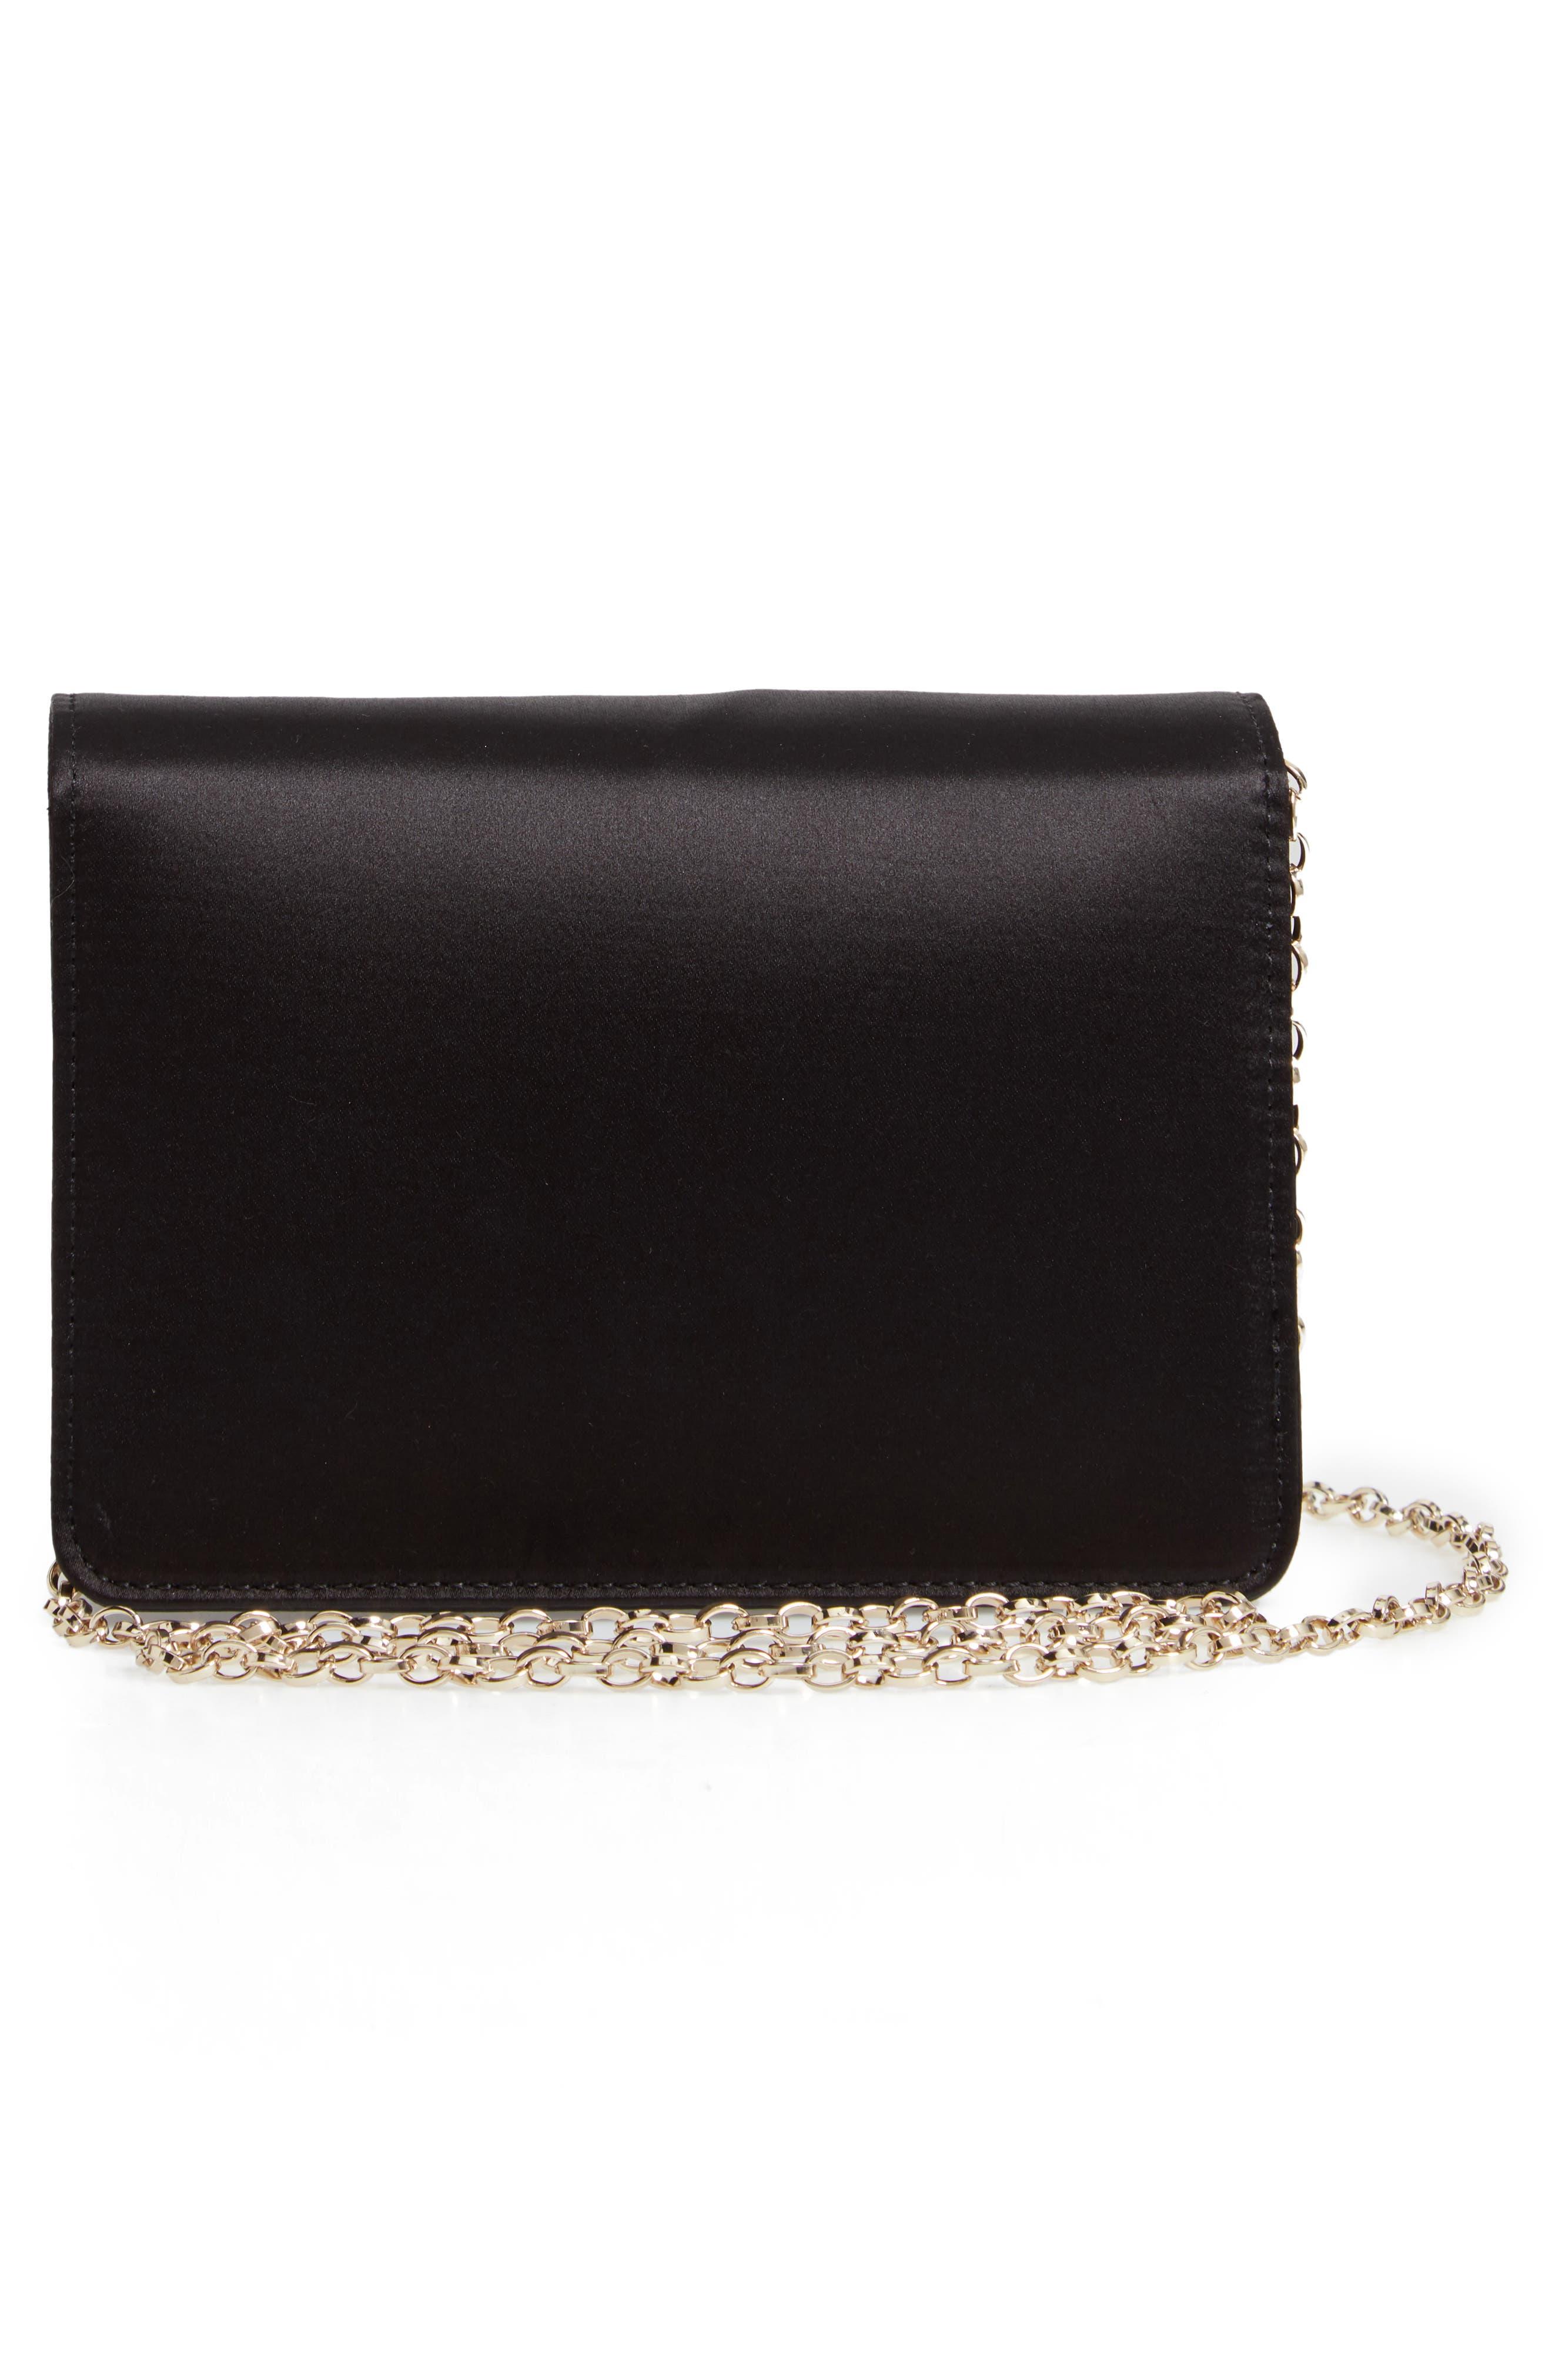 Eveelyn Bow Satin Evening Bag,                             Alternate thumbnail 3, color,                             BLACK